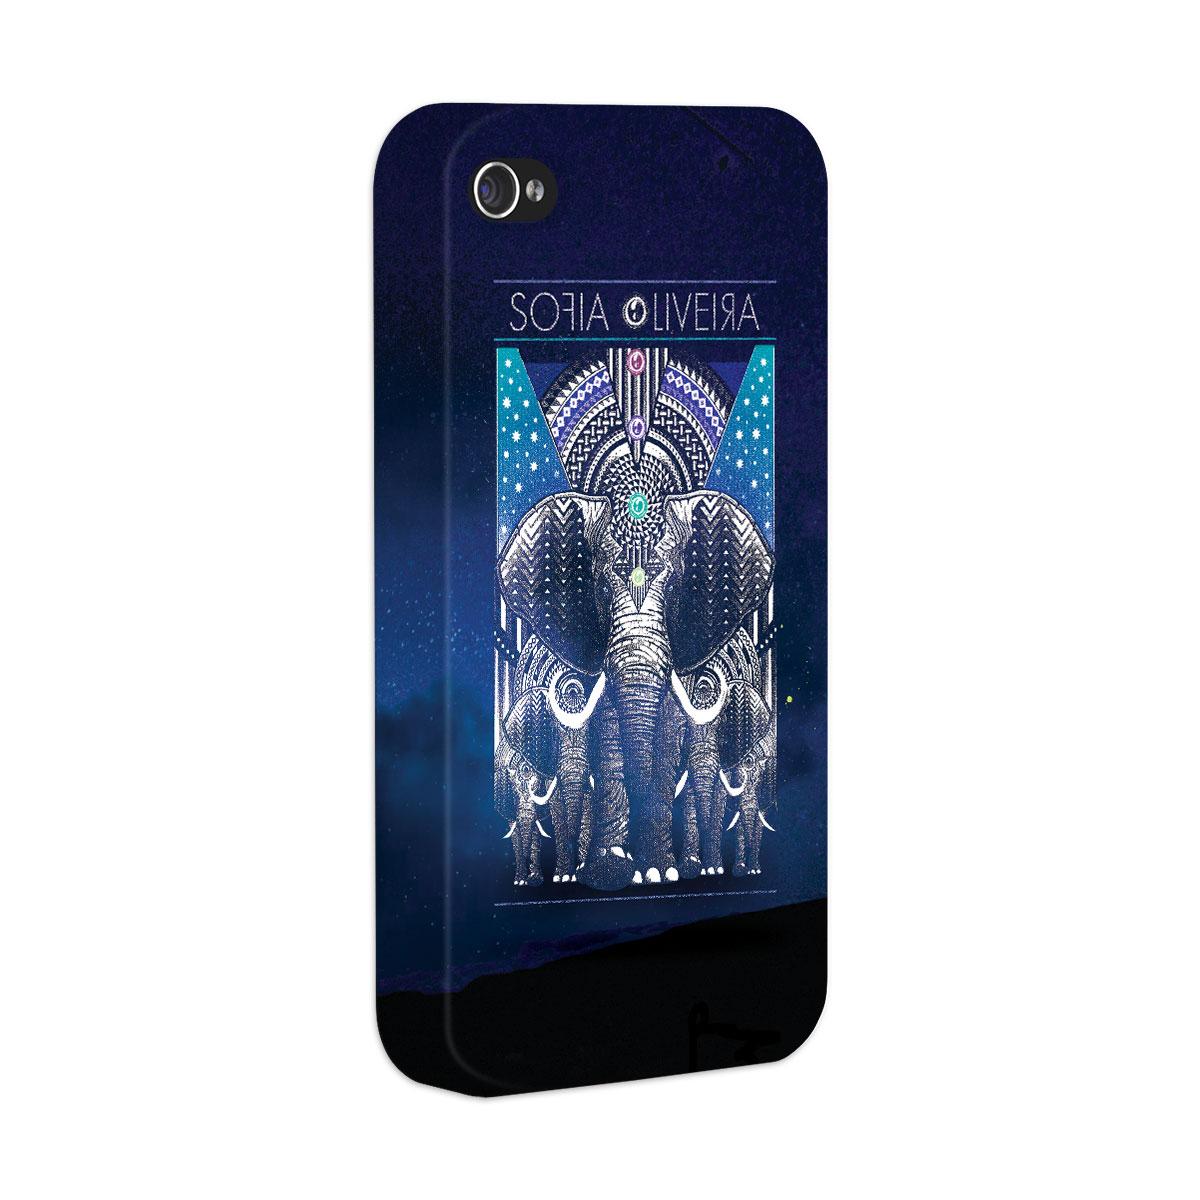 Capa para iPhone 4/4S Sofia Oliveira Elephant